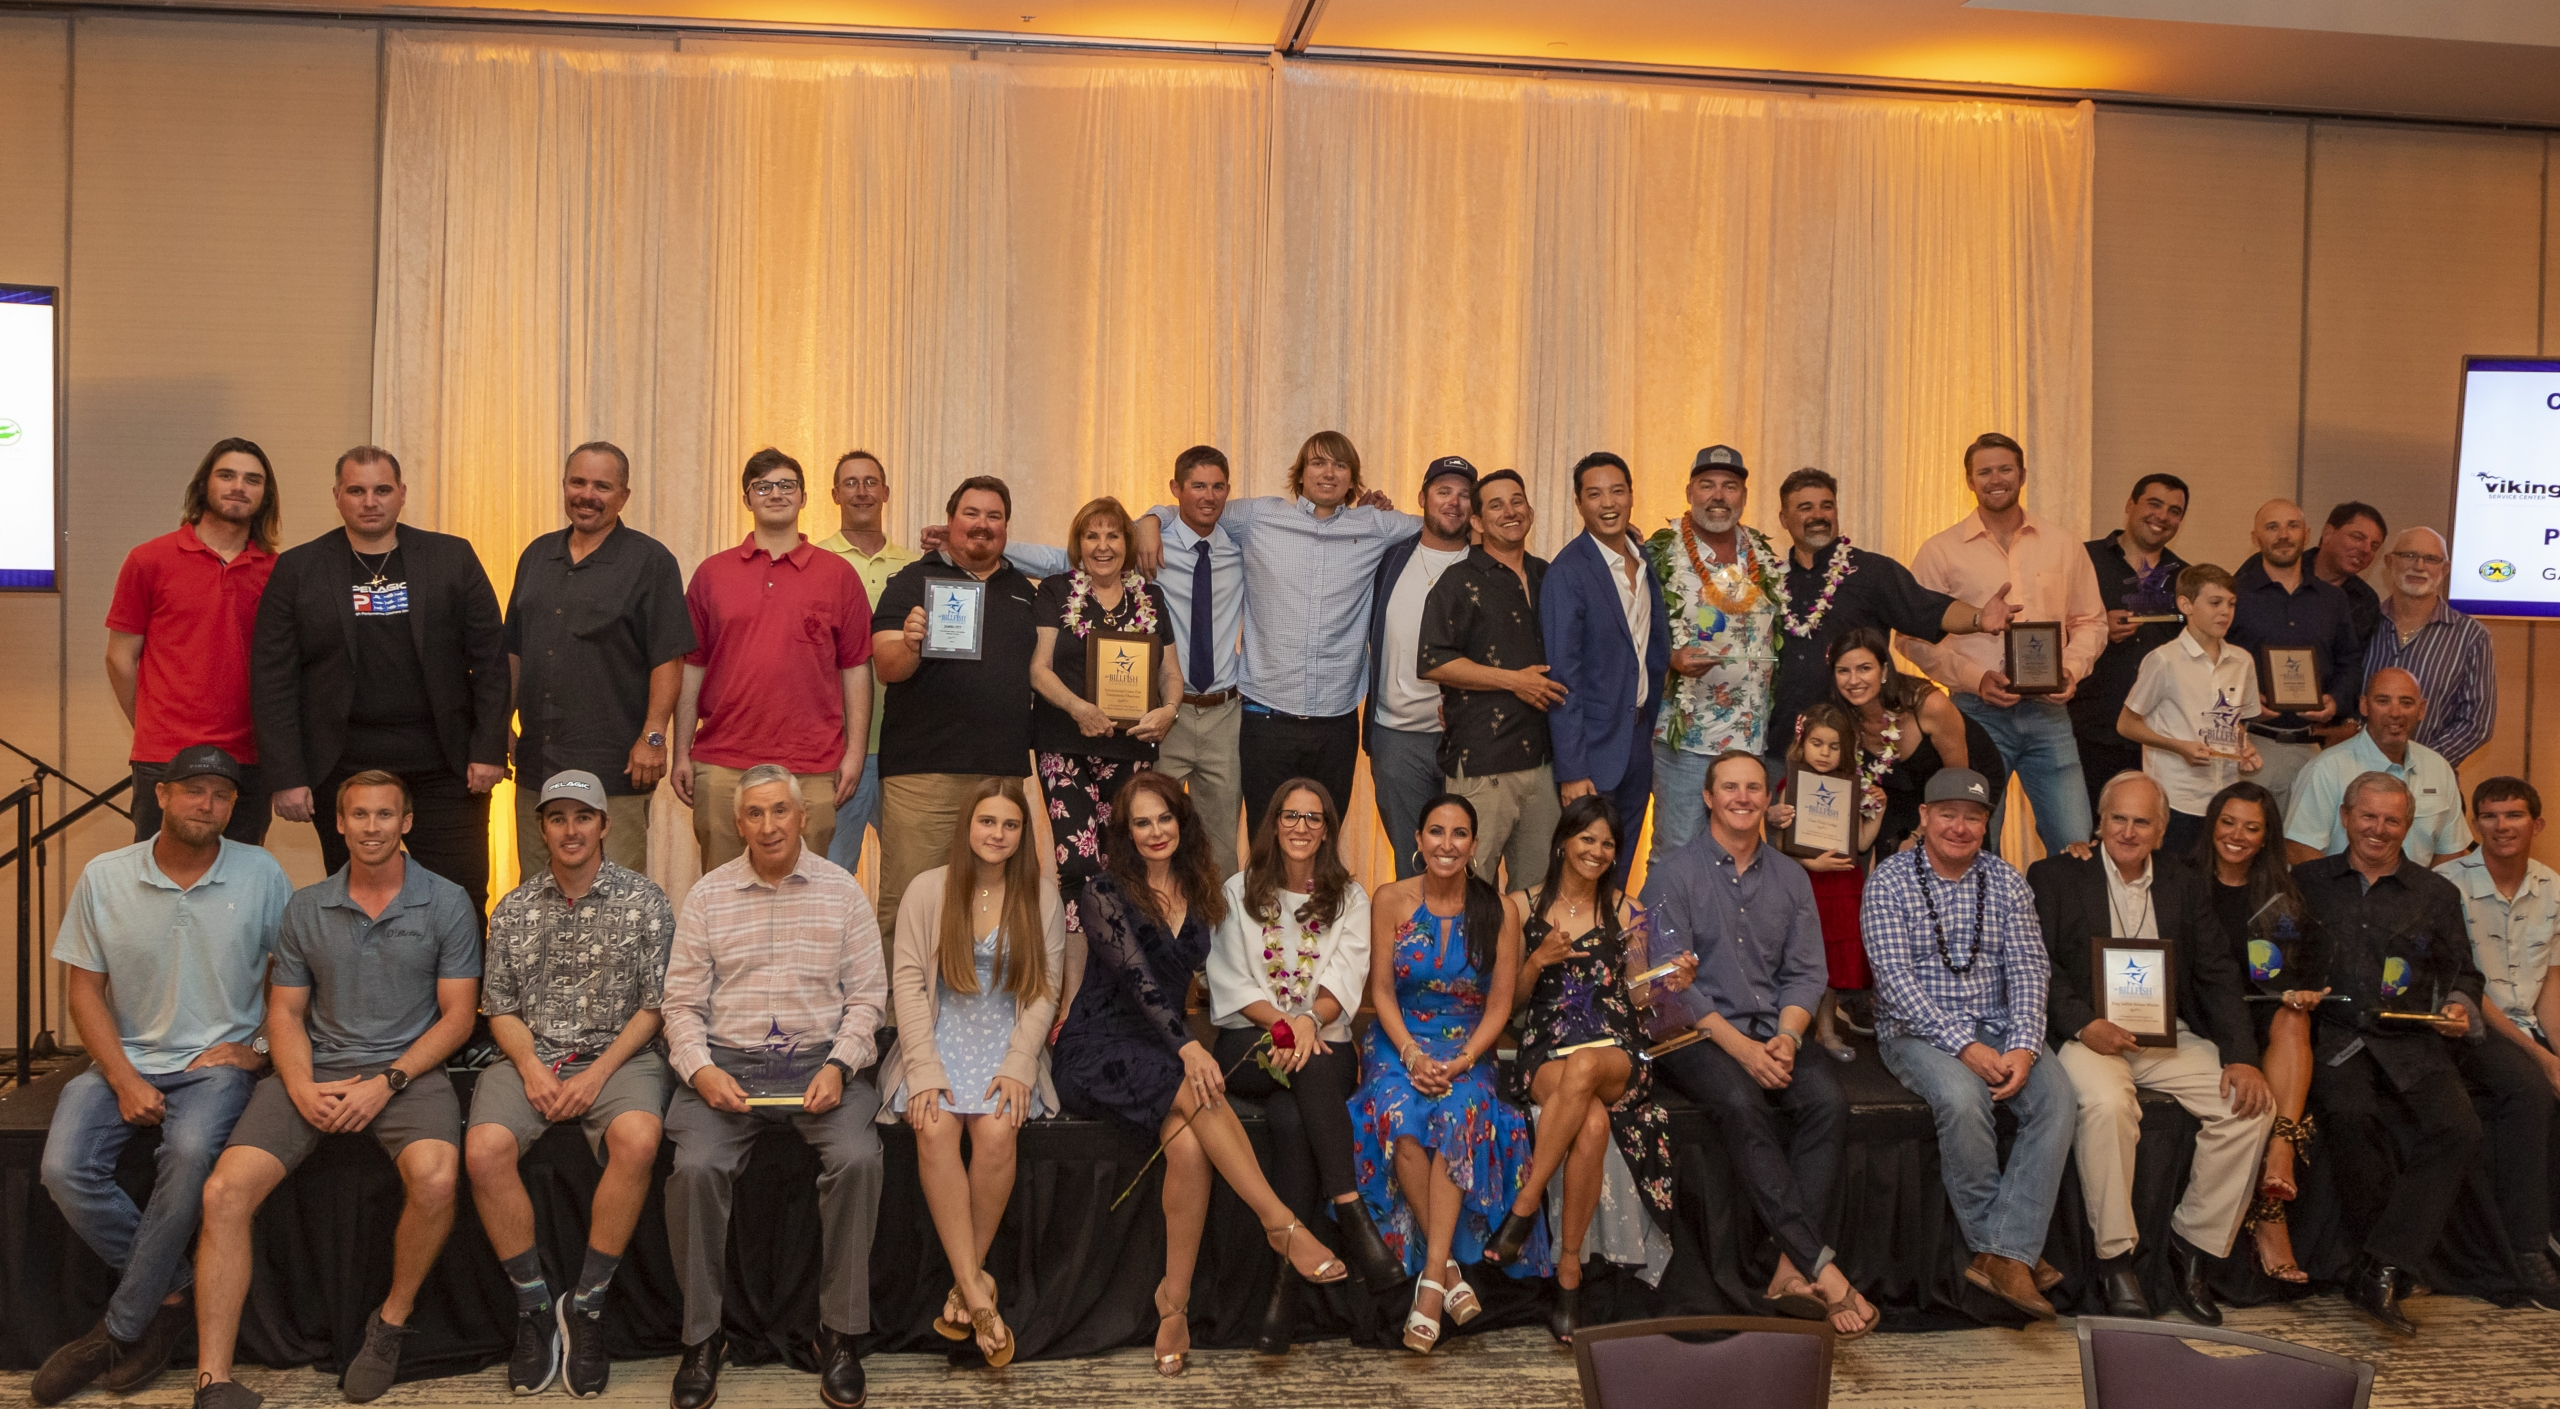 2019 Tag & Release Awards Ceremony Recap | The Billfish Foundation